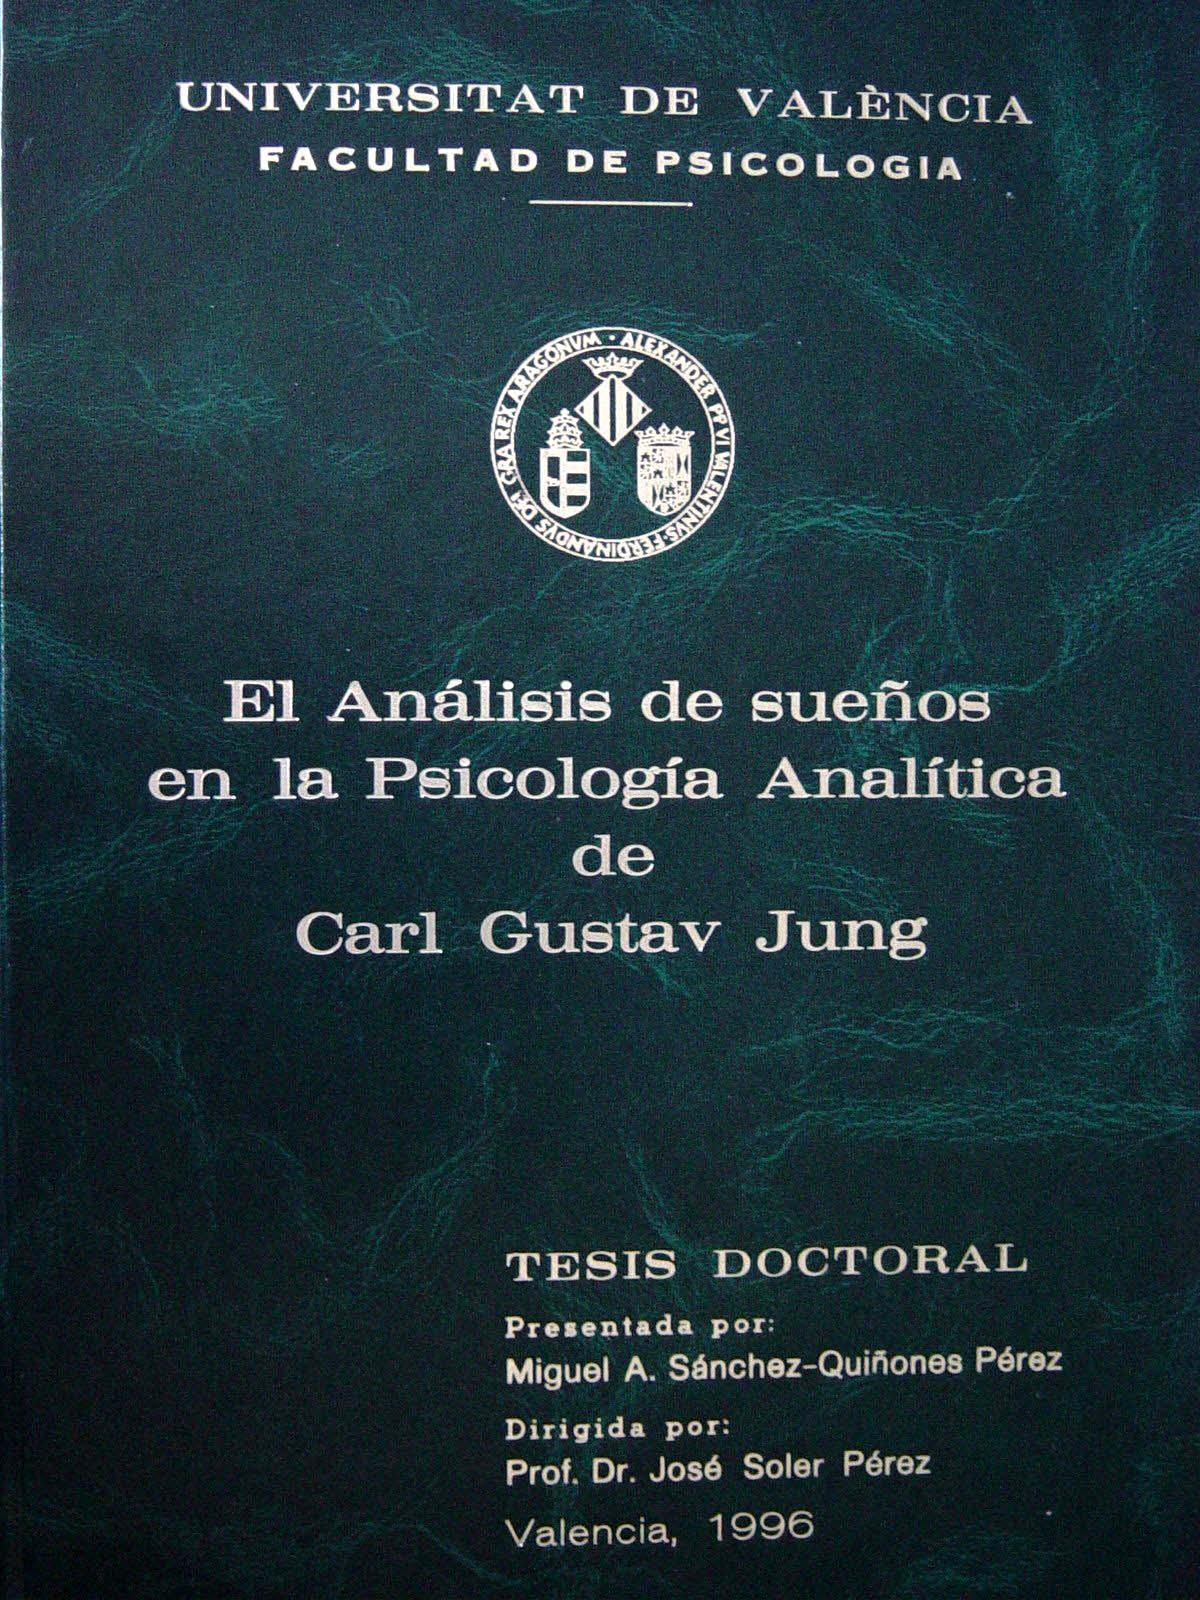 Tesis Doctoral. Pedro Prieto Martín